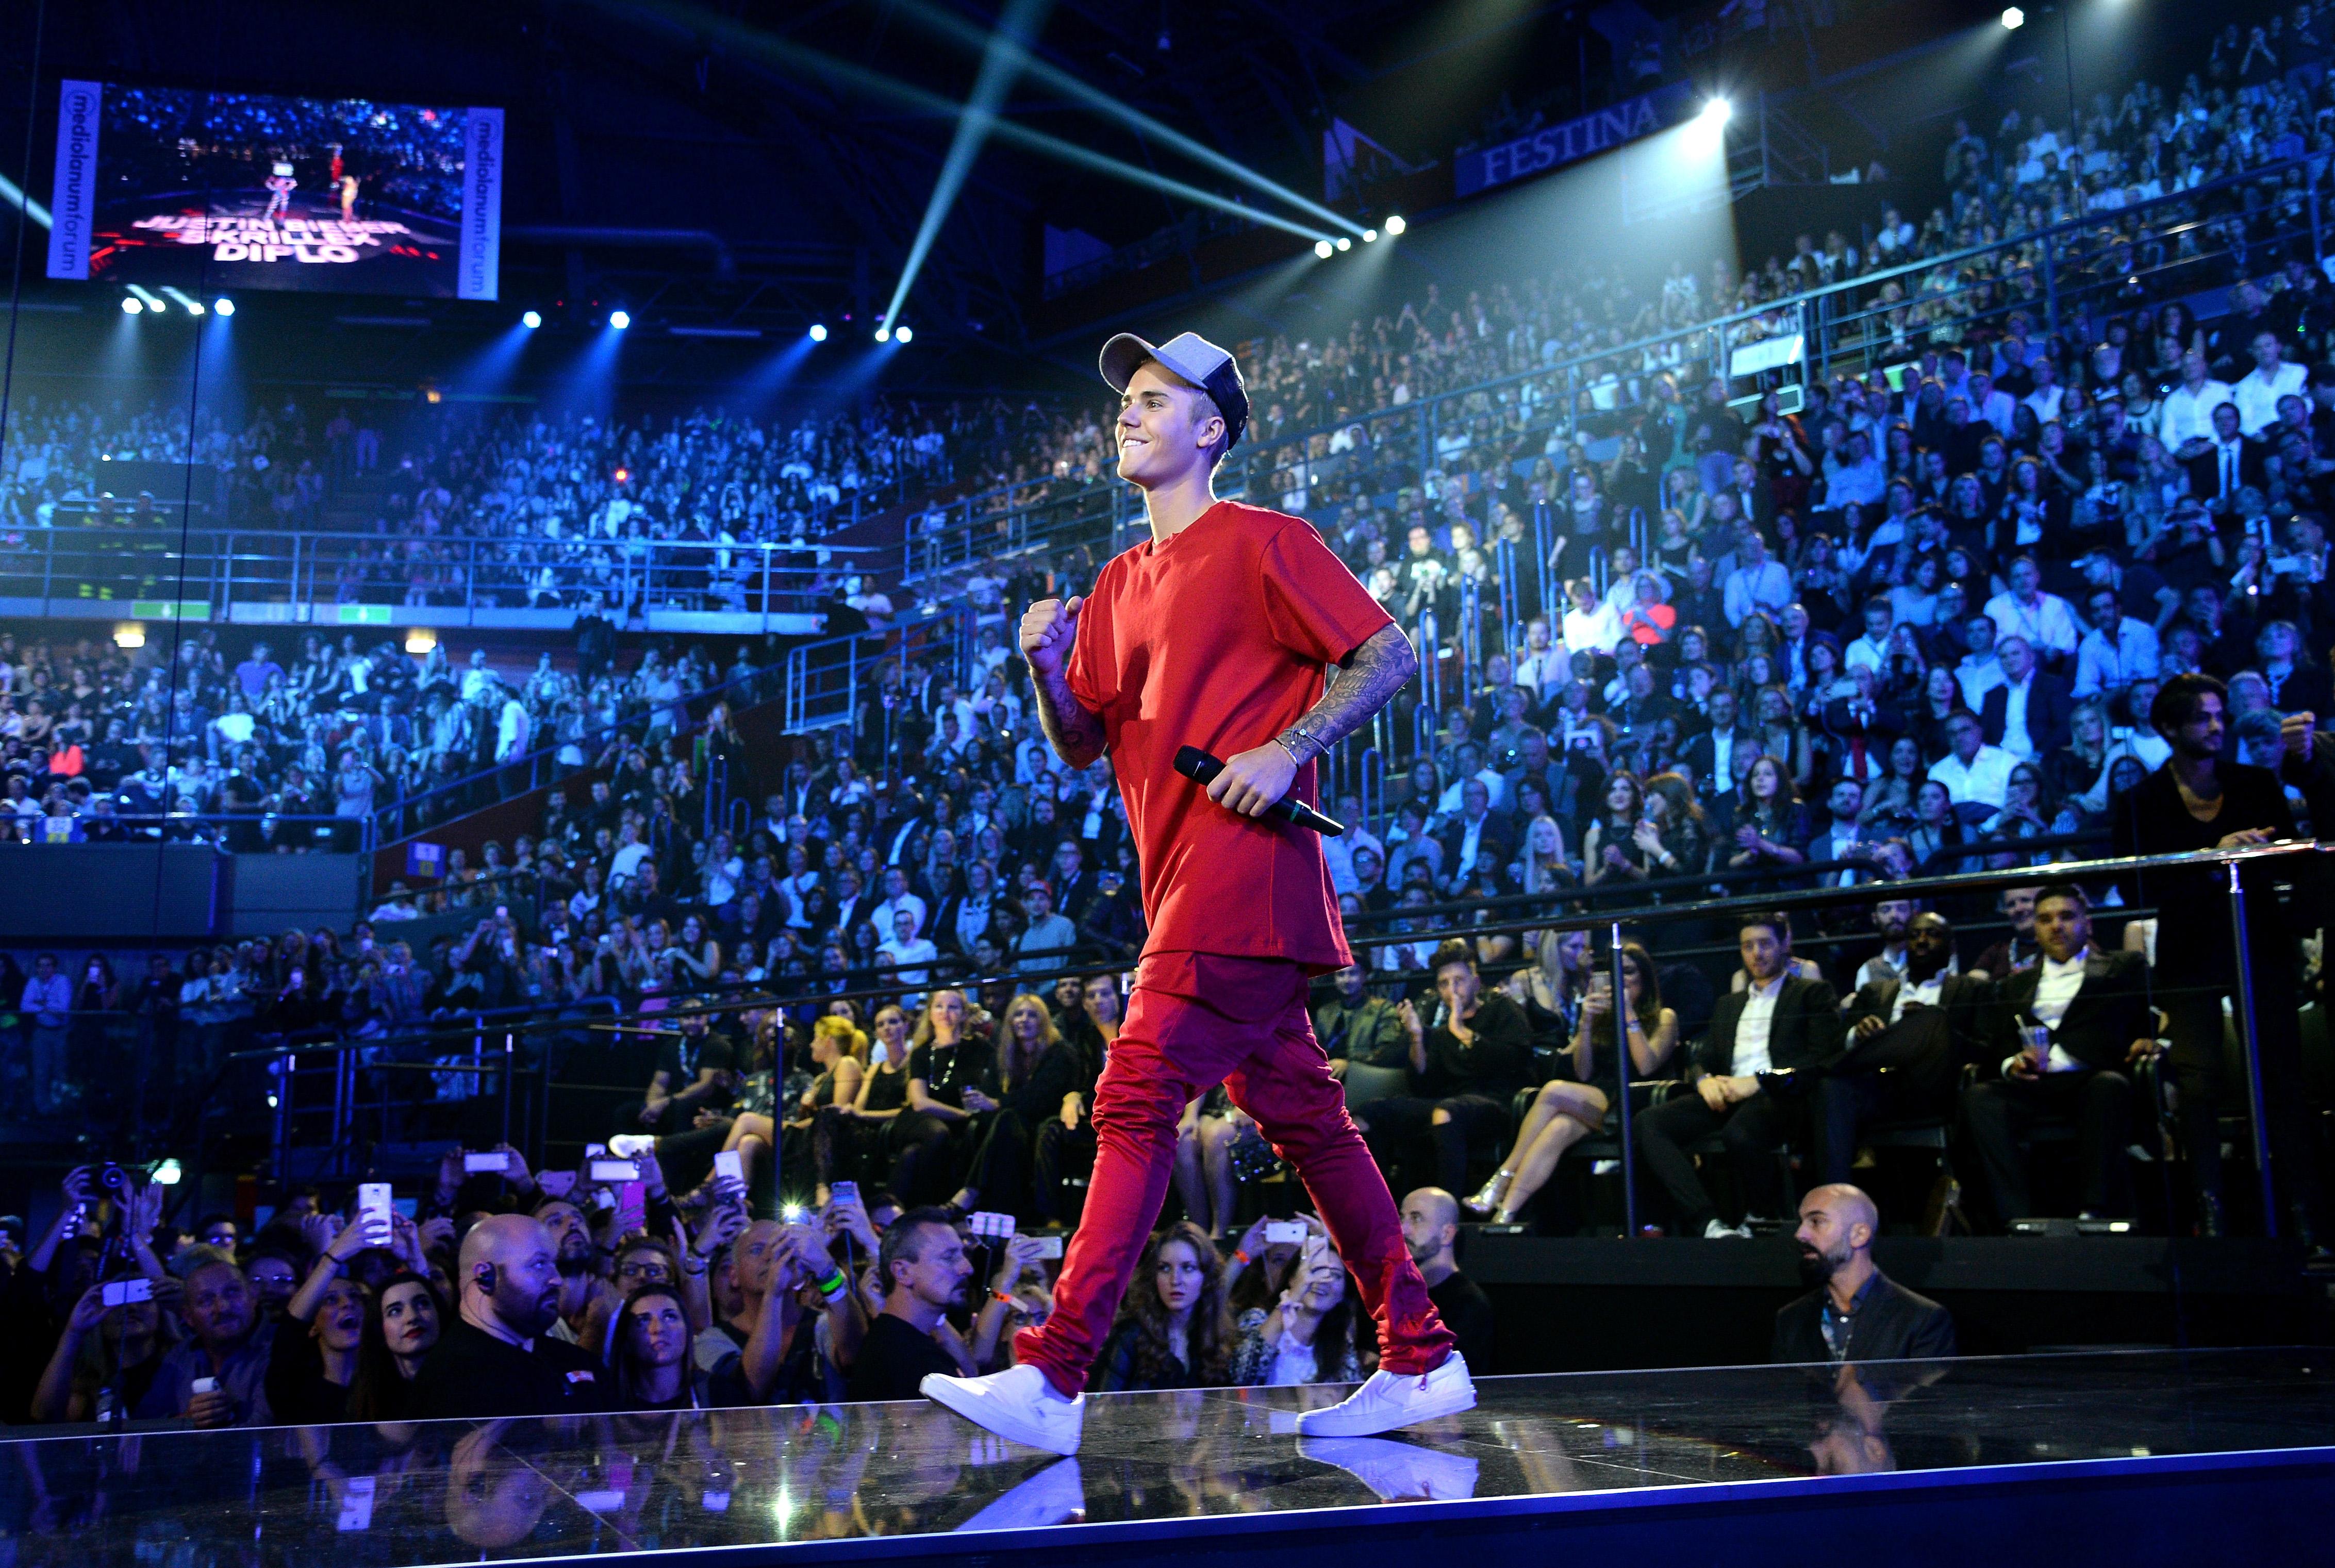 Justin Bieber Unveils 'Purpose' Songs via Graffiti